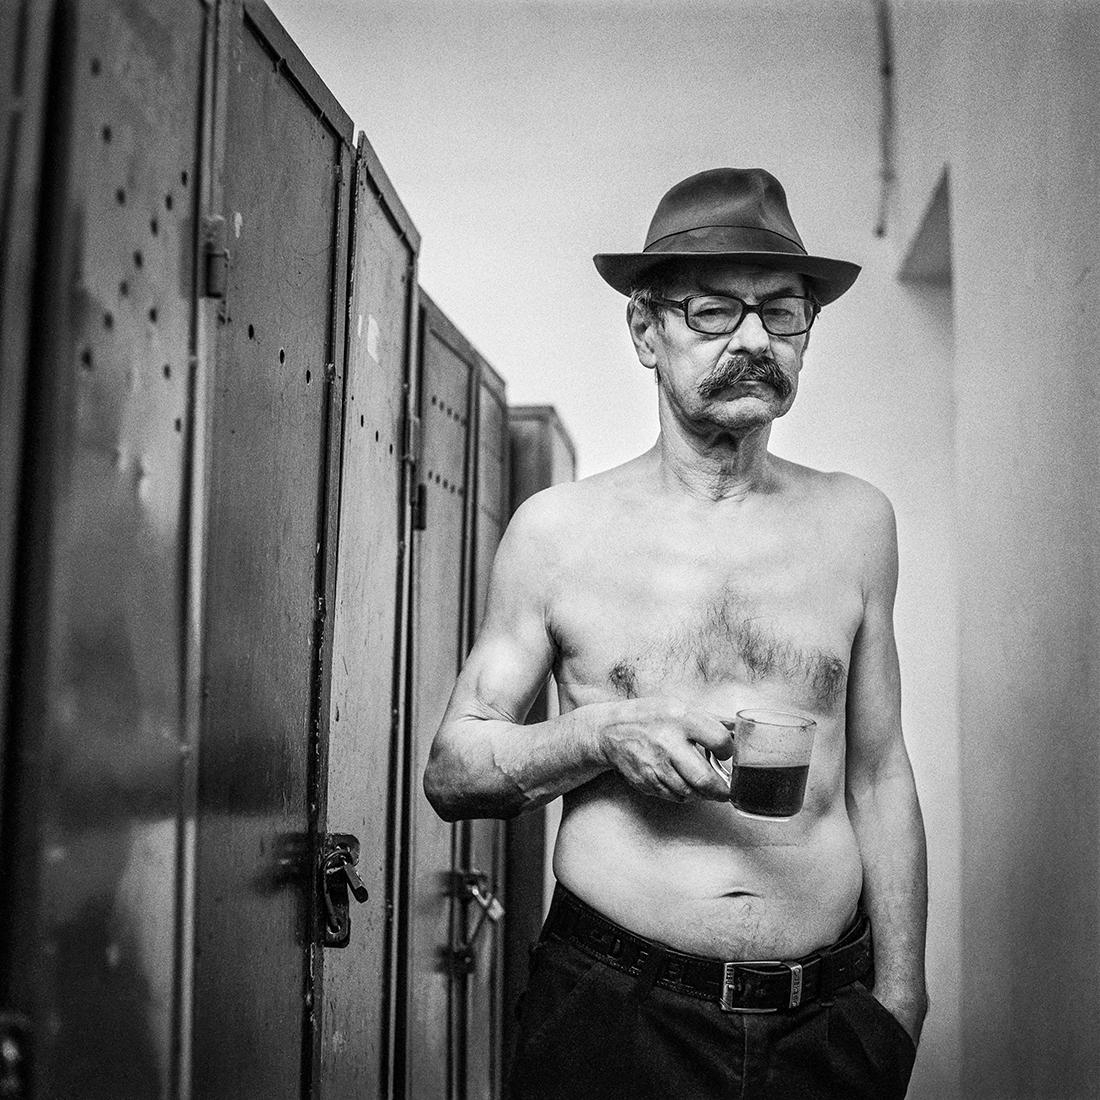 © Przemysław Kot: Men's cloakroom / MonoVisions Photography Awards 2020 winner